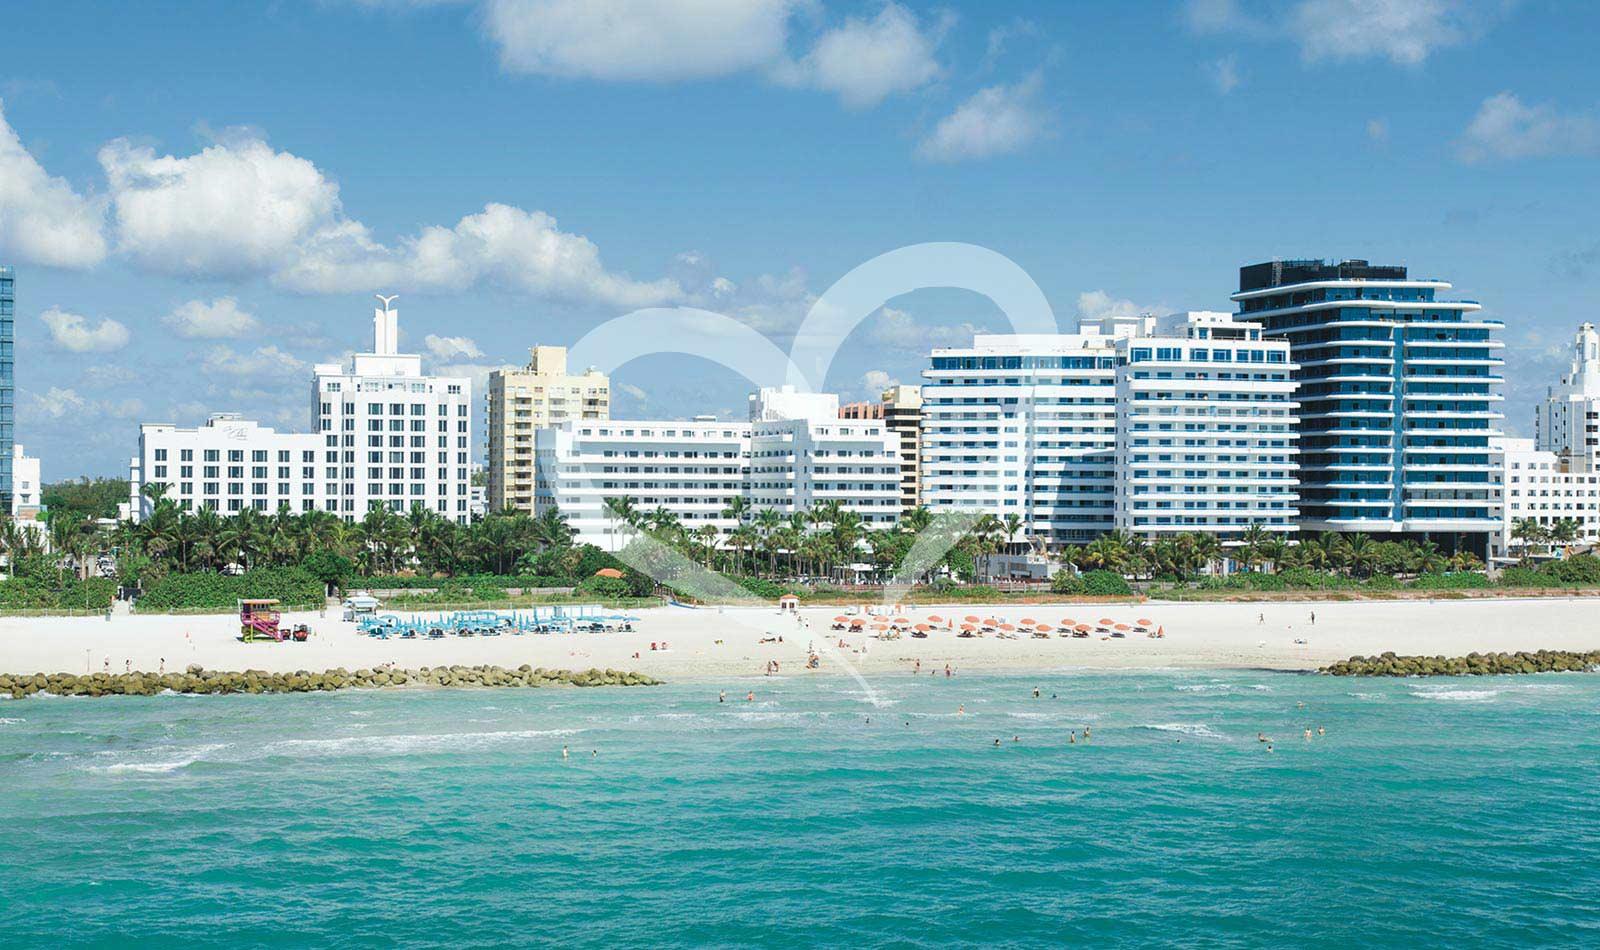 riu hotels & resorts plaza miami beach 2021/2022 - club